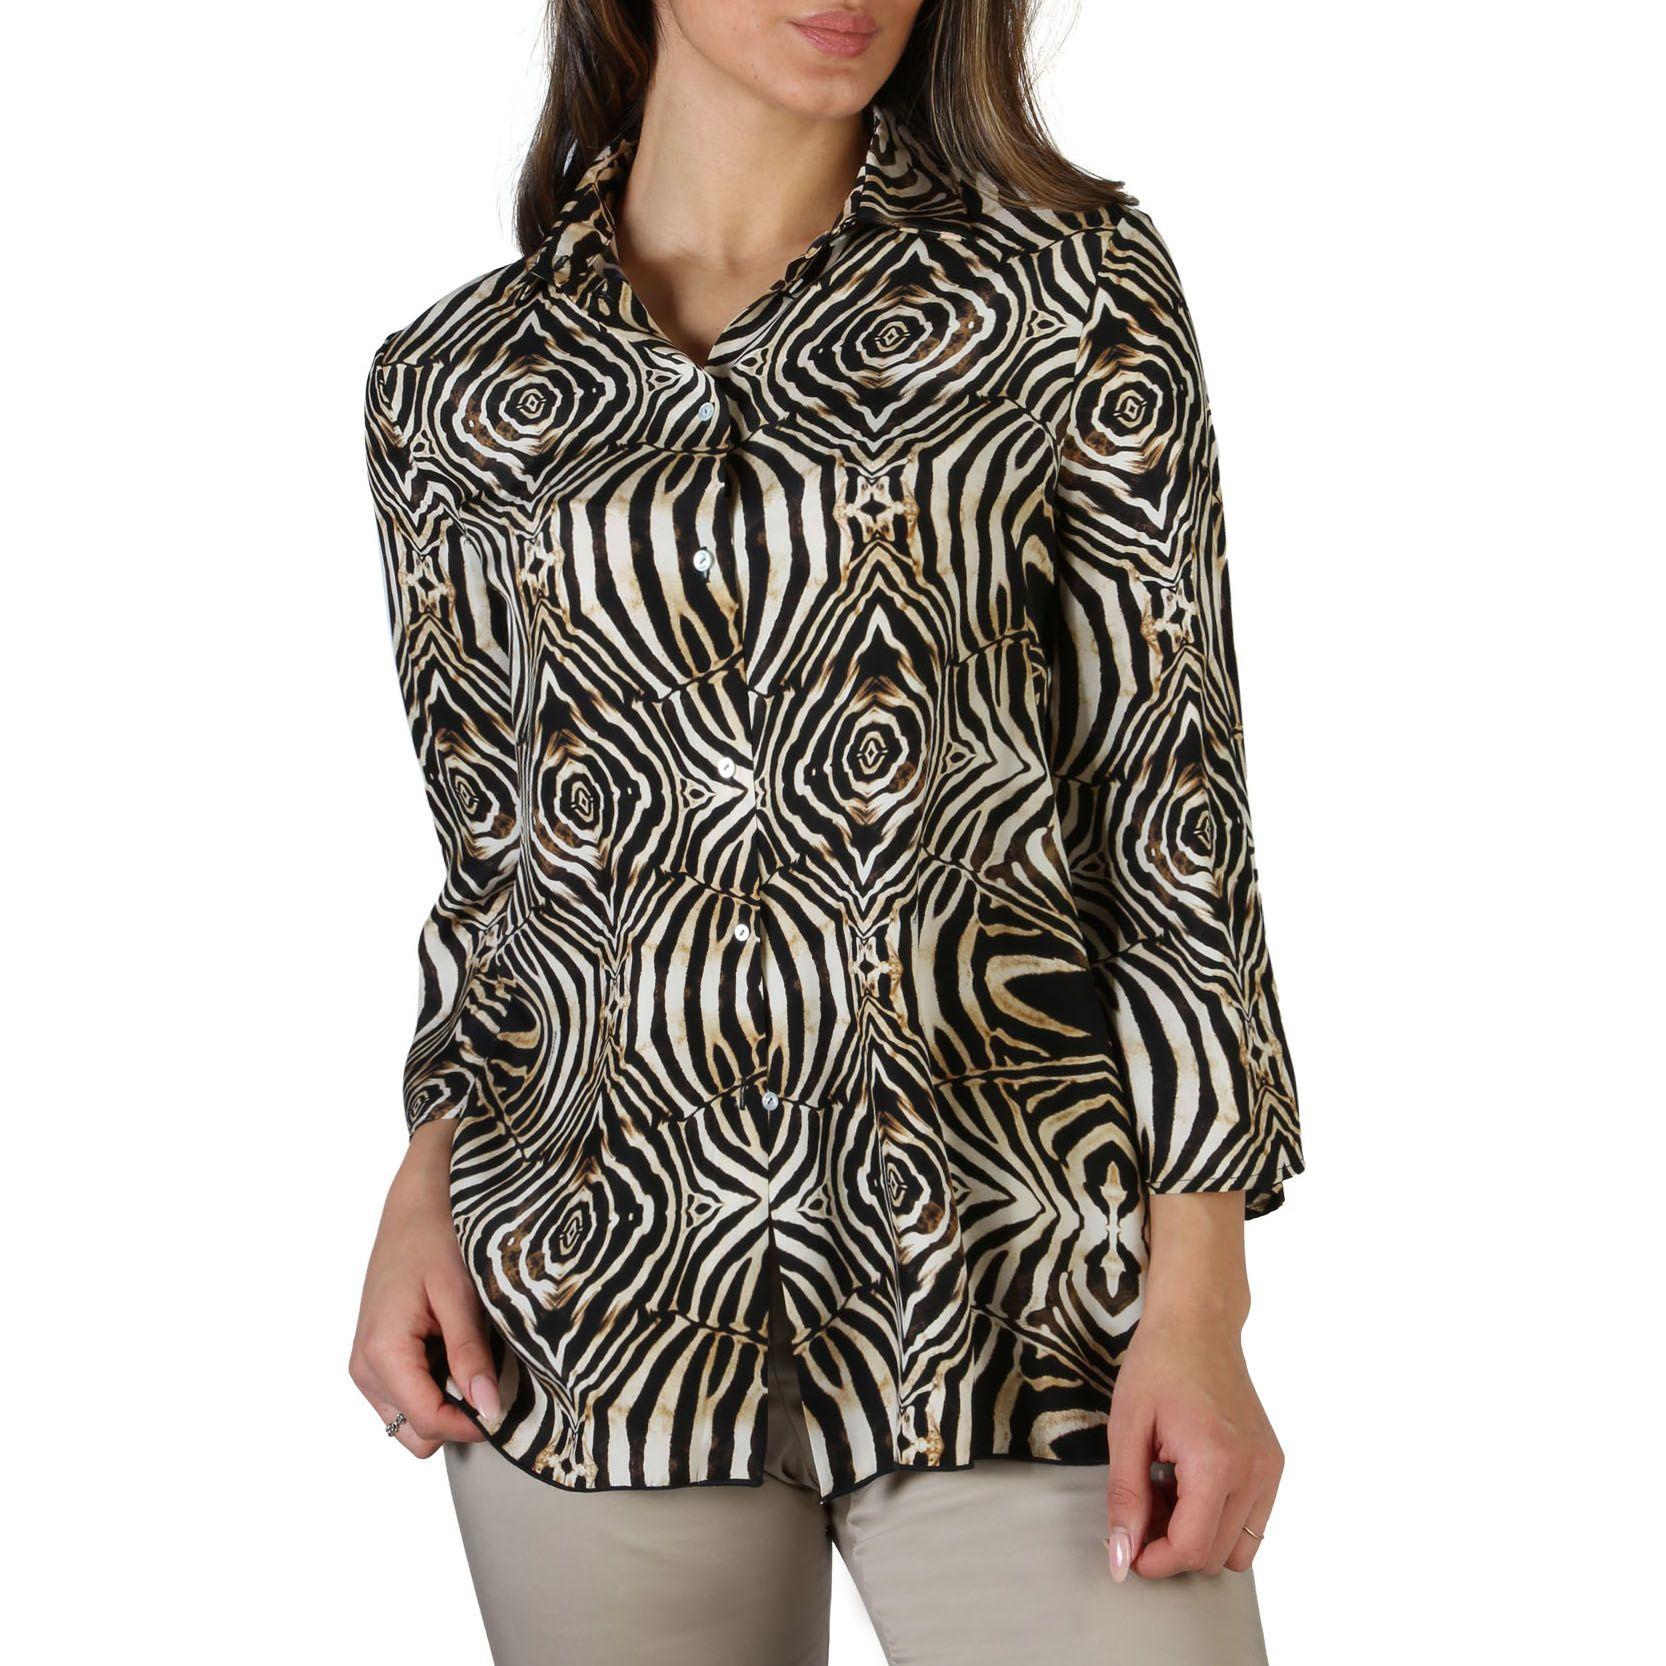 Fontana 2.0 Womens Shirts